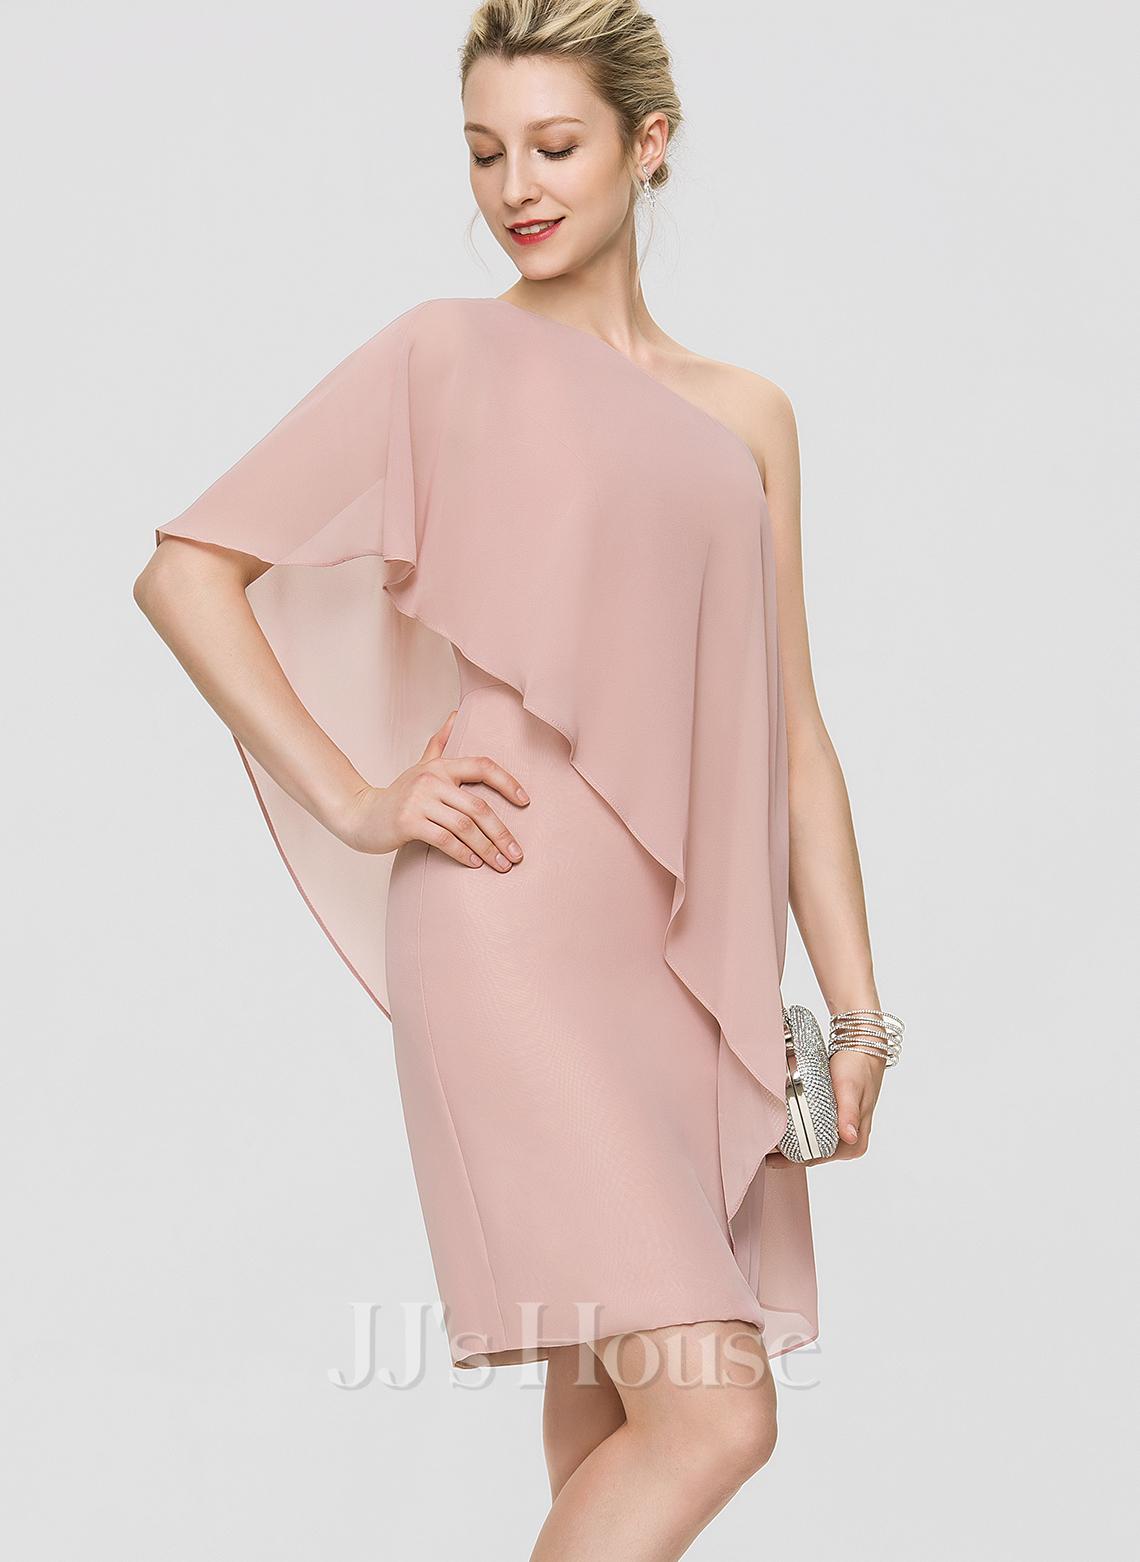 Sheath/Column One-Shoulder Knee-Length Chiffon Cocktail Dress With Cascading Ruffles